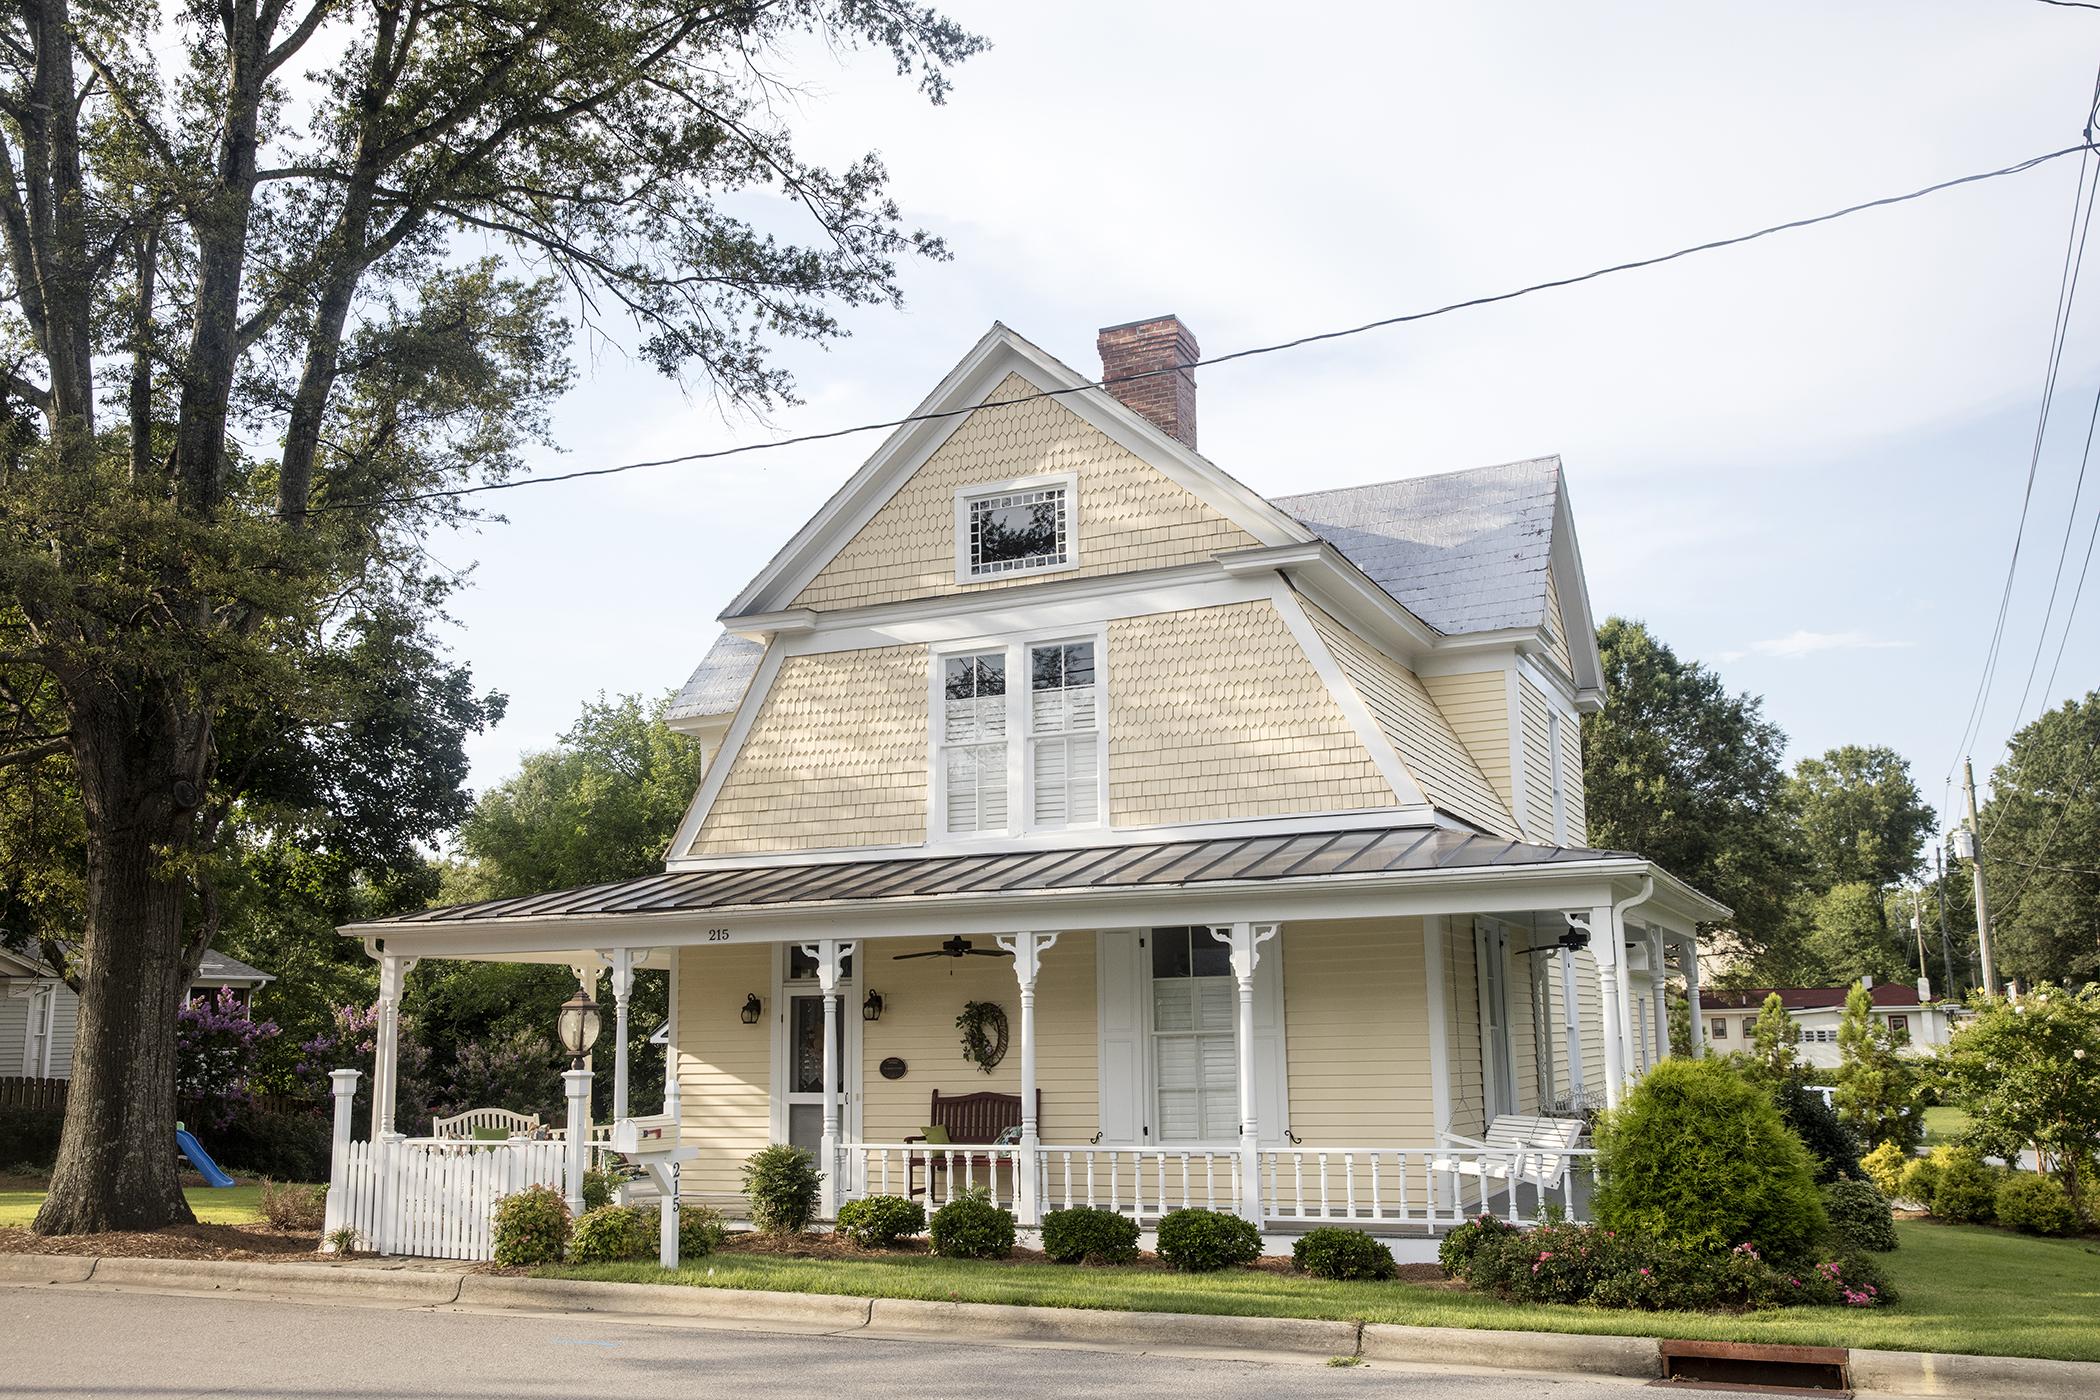 A home in Apex, NC